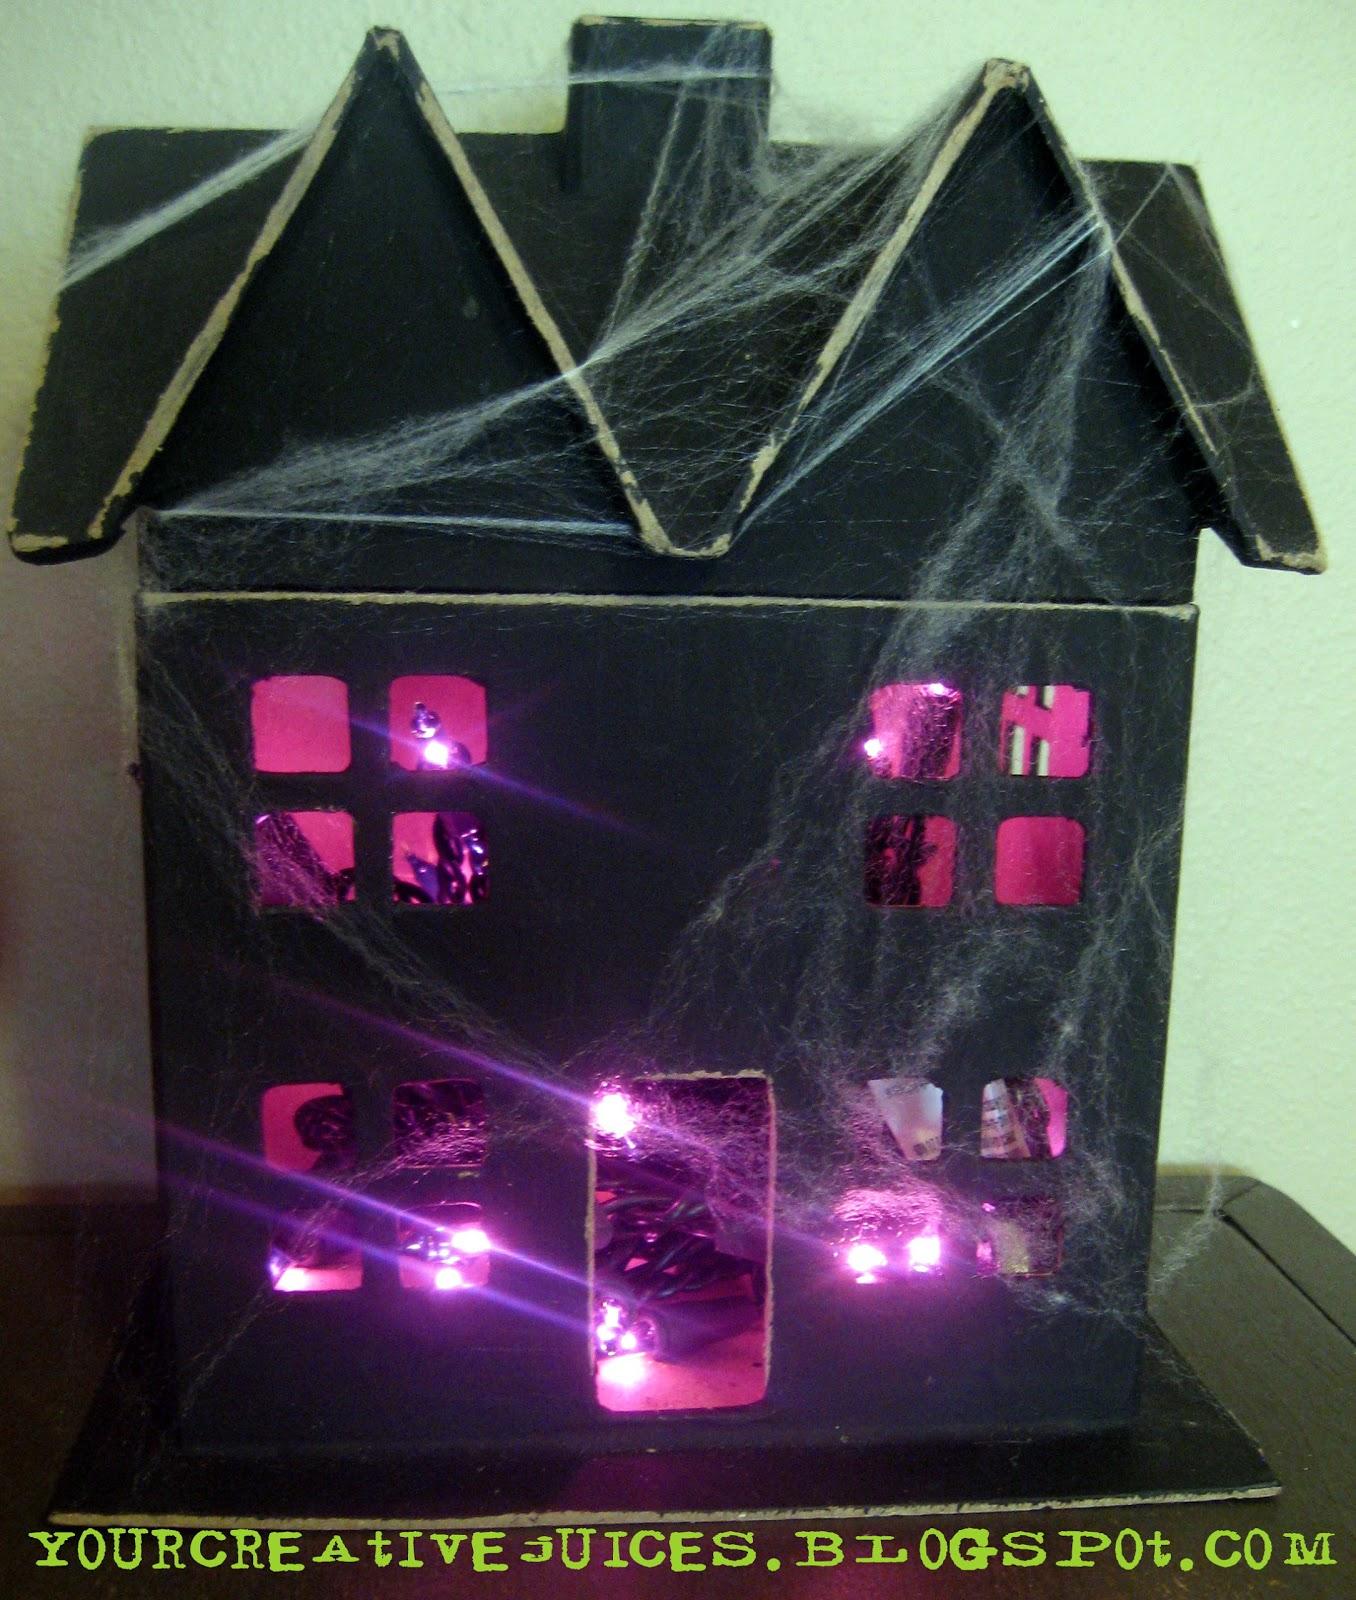 Creative juices spoooooky ideas for How to make a cardboard haunted house